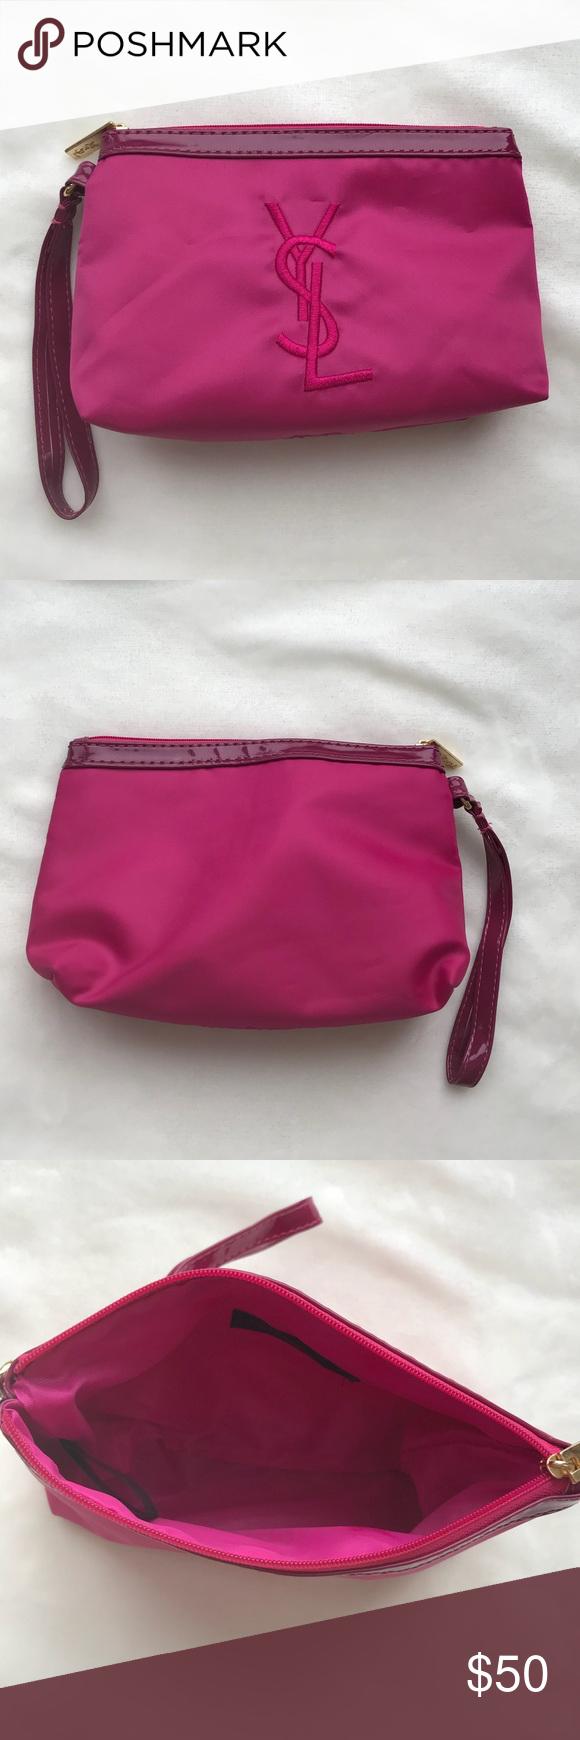 88c895da17 YSL Cosmetics Bag YSL Cosmetics Bag in pink Spotless interior Yves Saint  Laurent Bags Cosmetic Bags   Cases